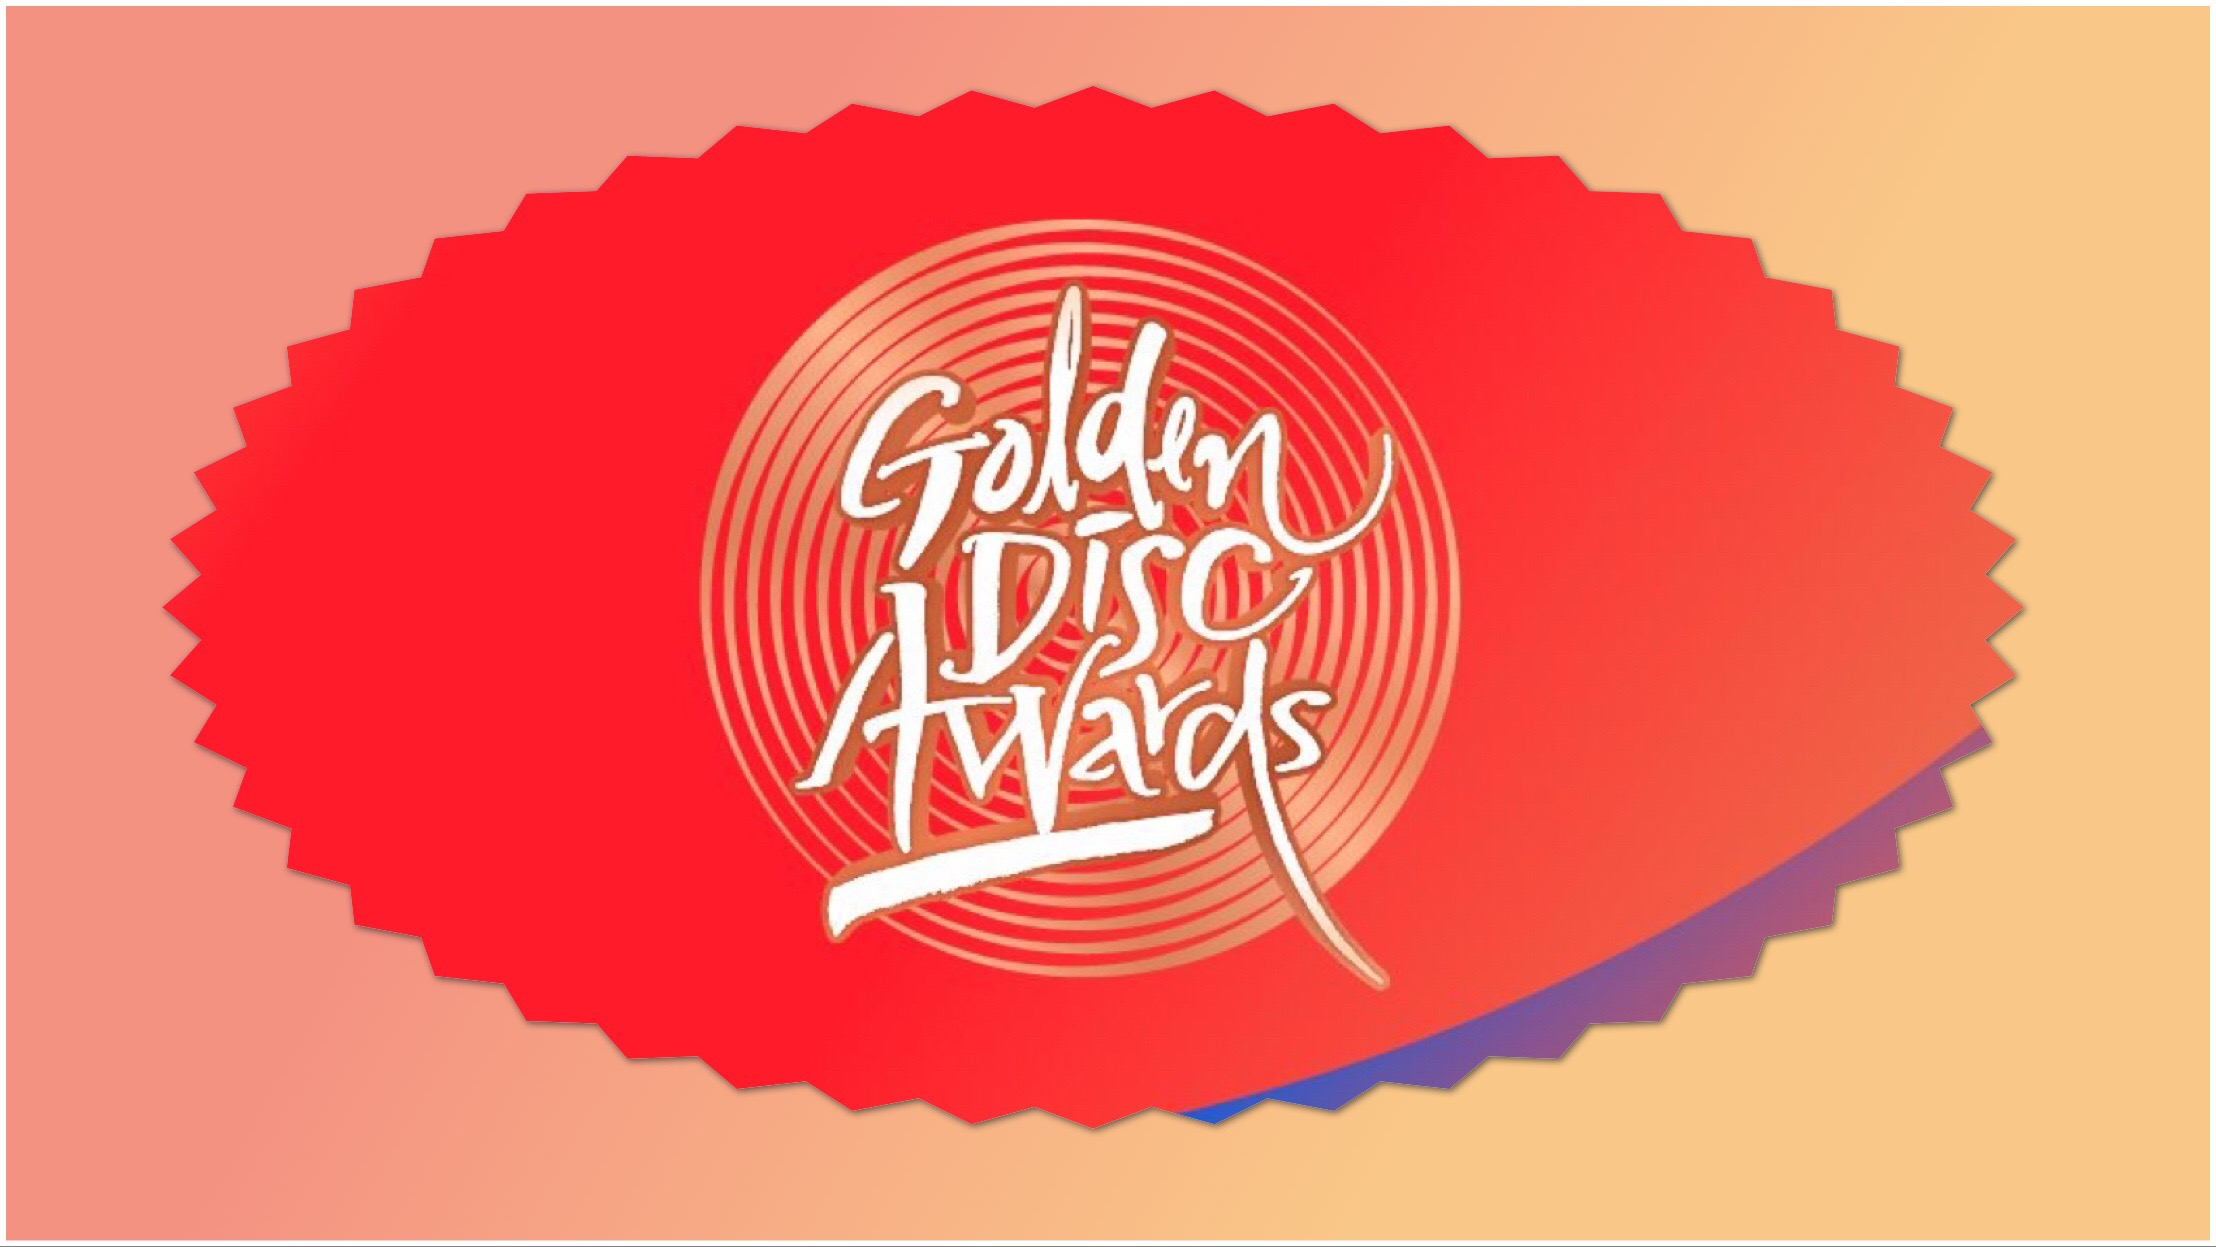 Golden Disk Award 2019, imagen propiedad de JTBC